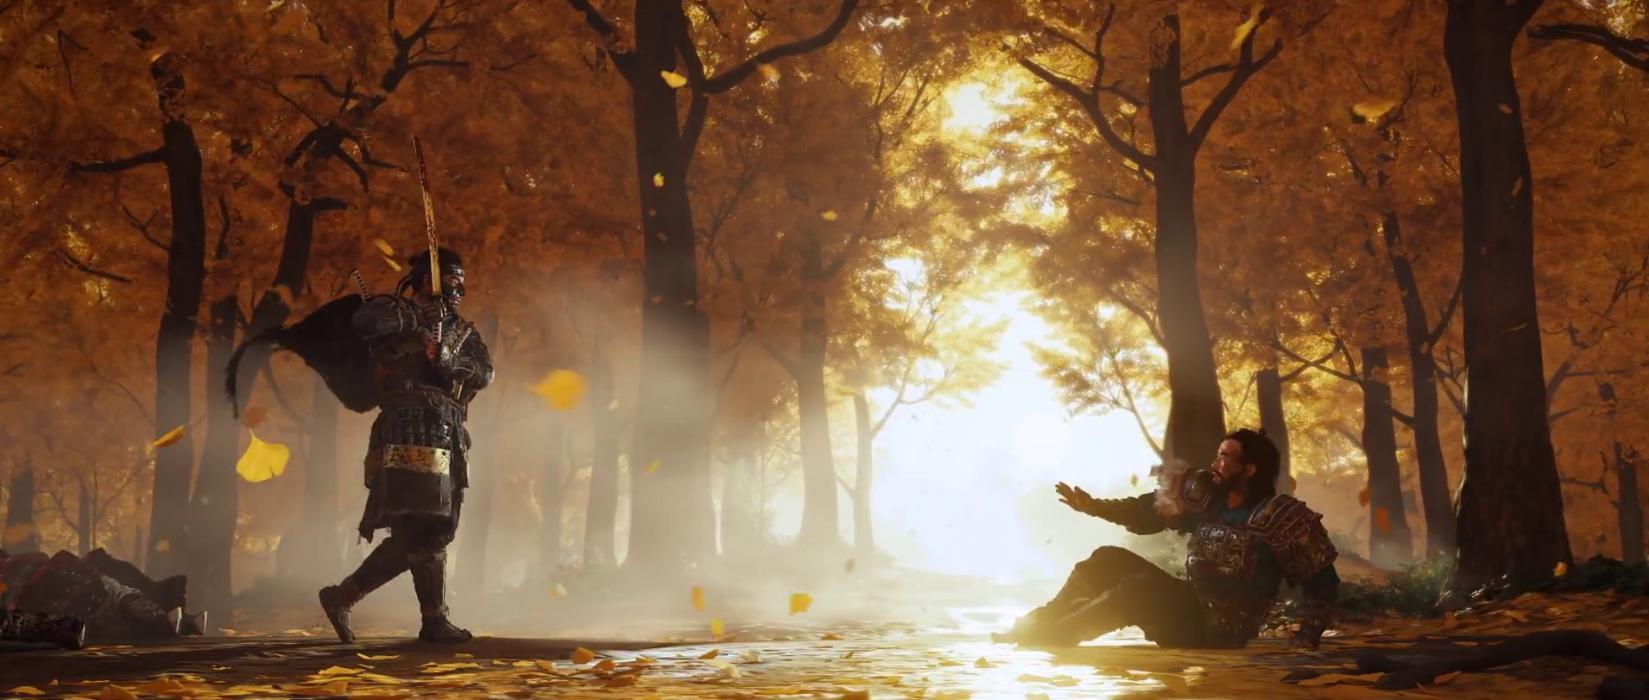 Tema Dinámico Gratuito Ghost of Tsushima PS4